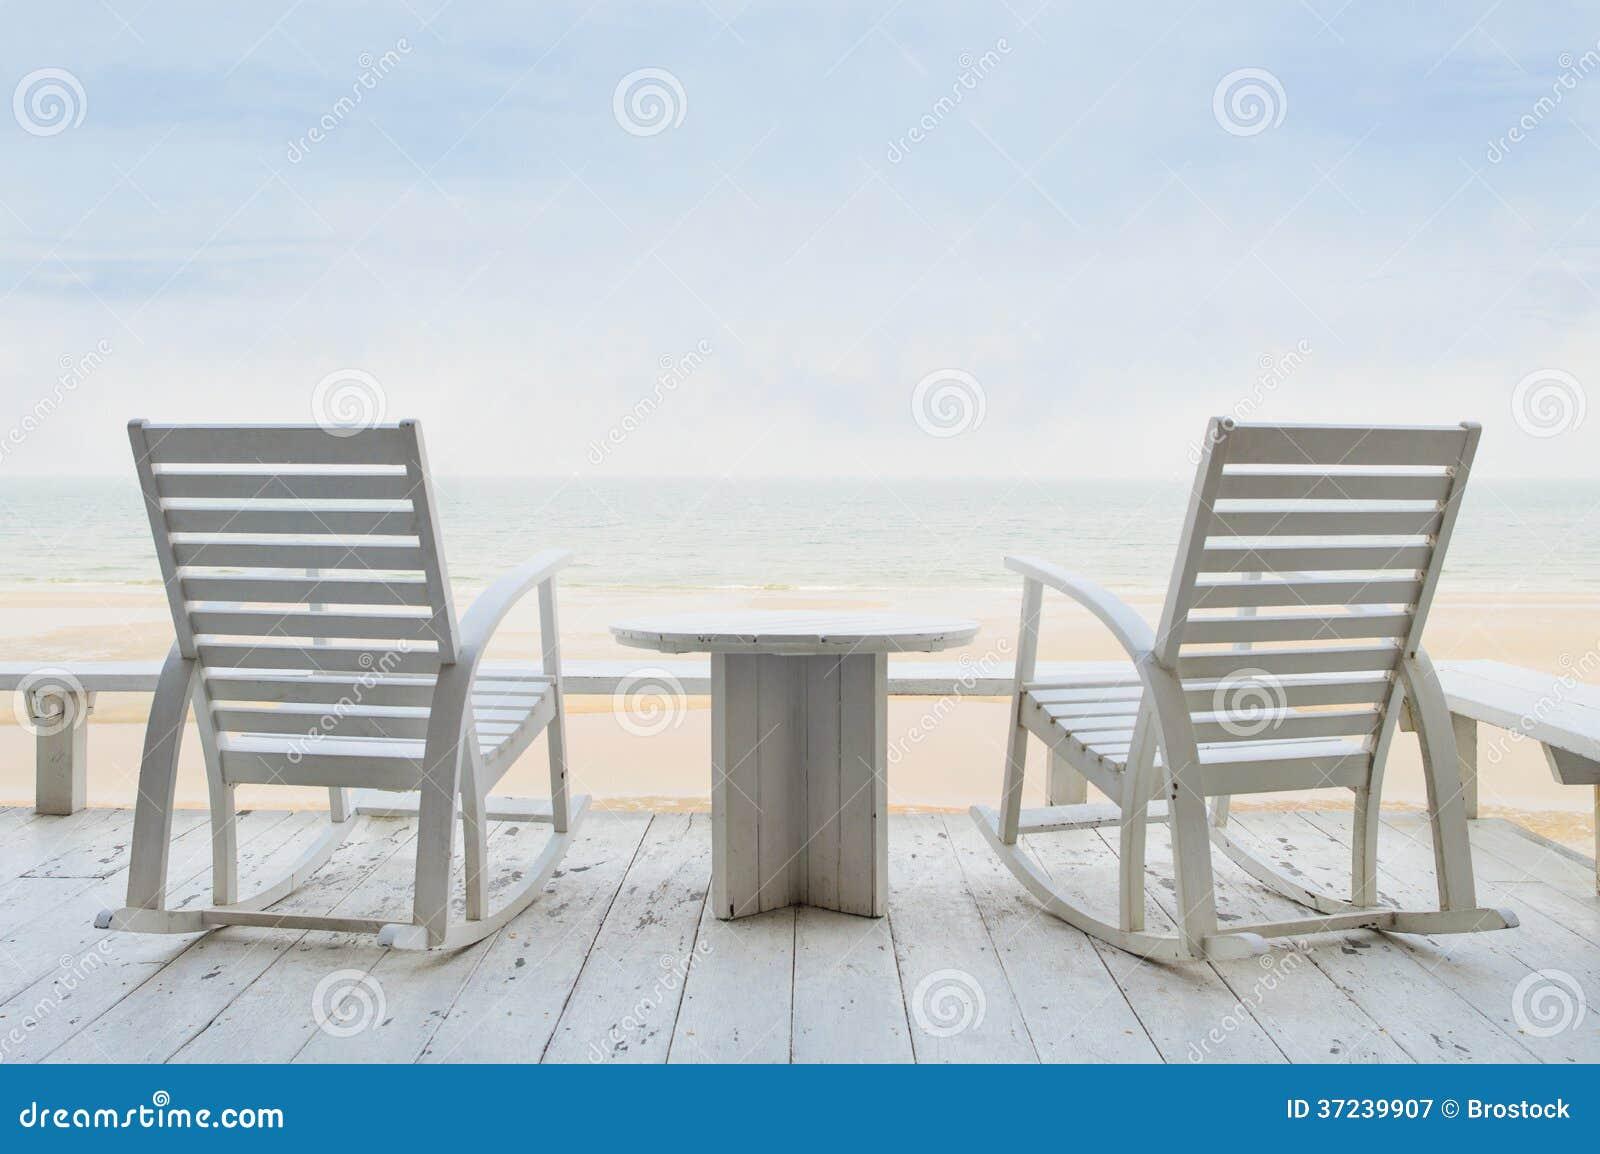 wei e schaukelst hle lizenzfreie stockfotografie bild 37239907. Black Bedroom Furniture Sets. Home Design Ideas